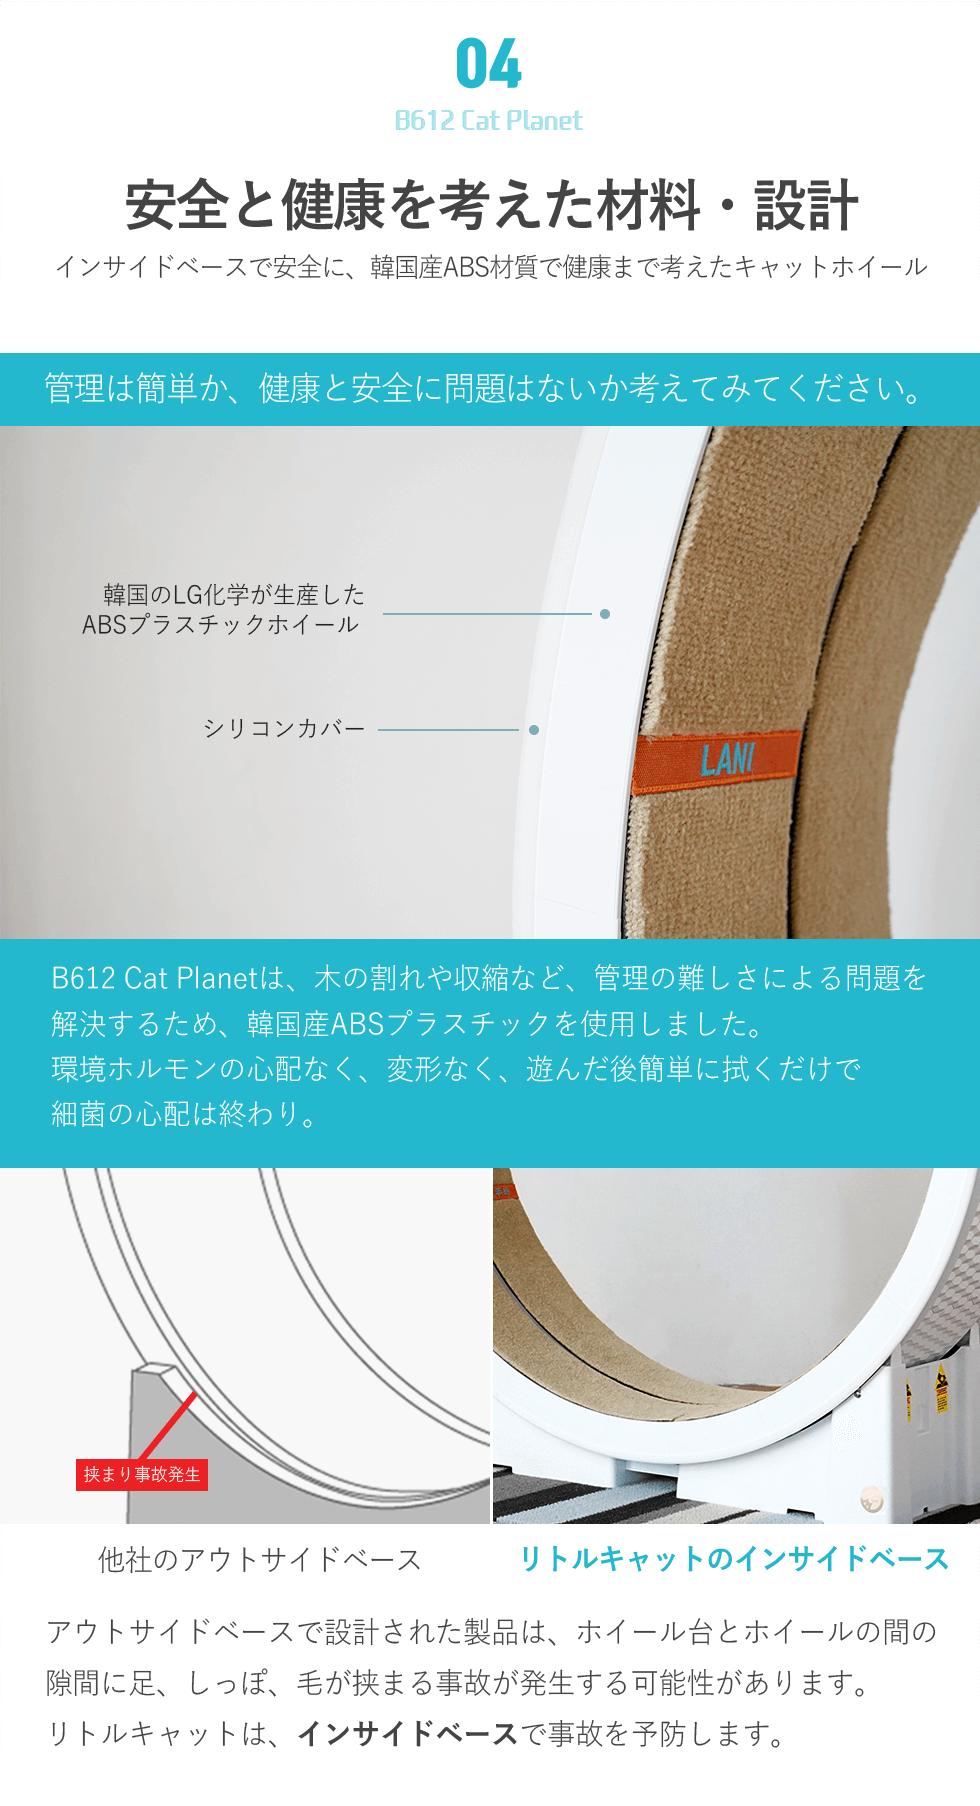 japan_detail_06_01.png